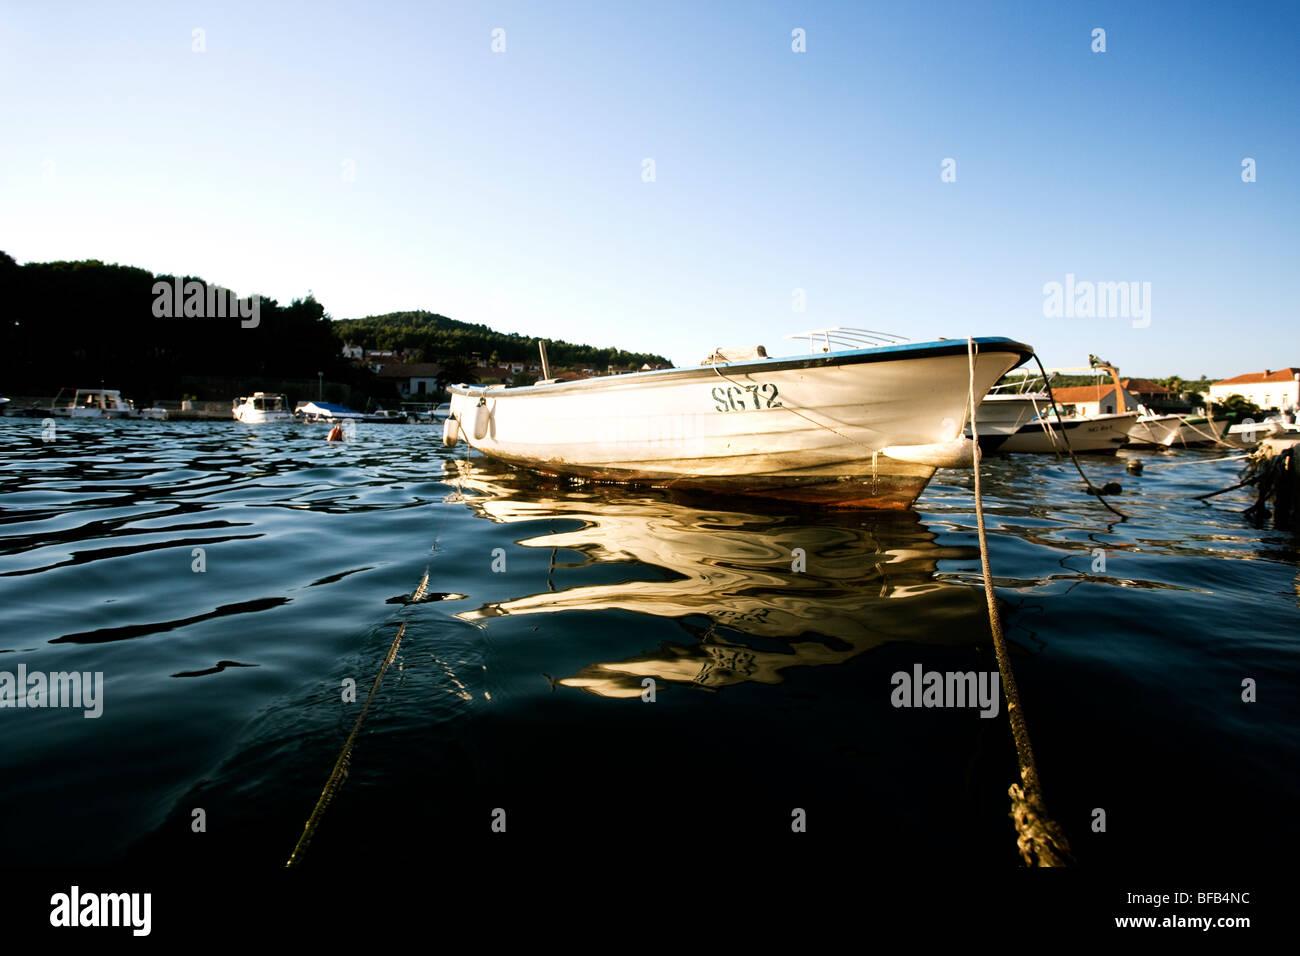 Rowing boat tied up, Stari Grad, Hvar Island, Croatia - Stock Image